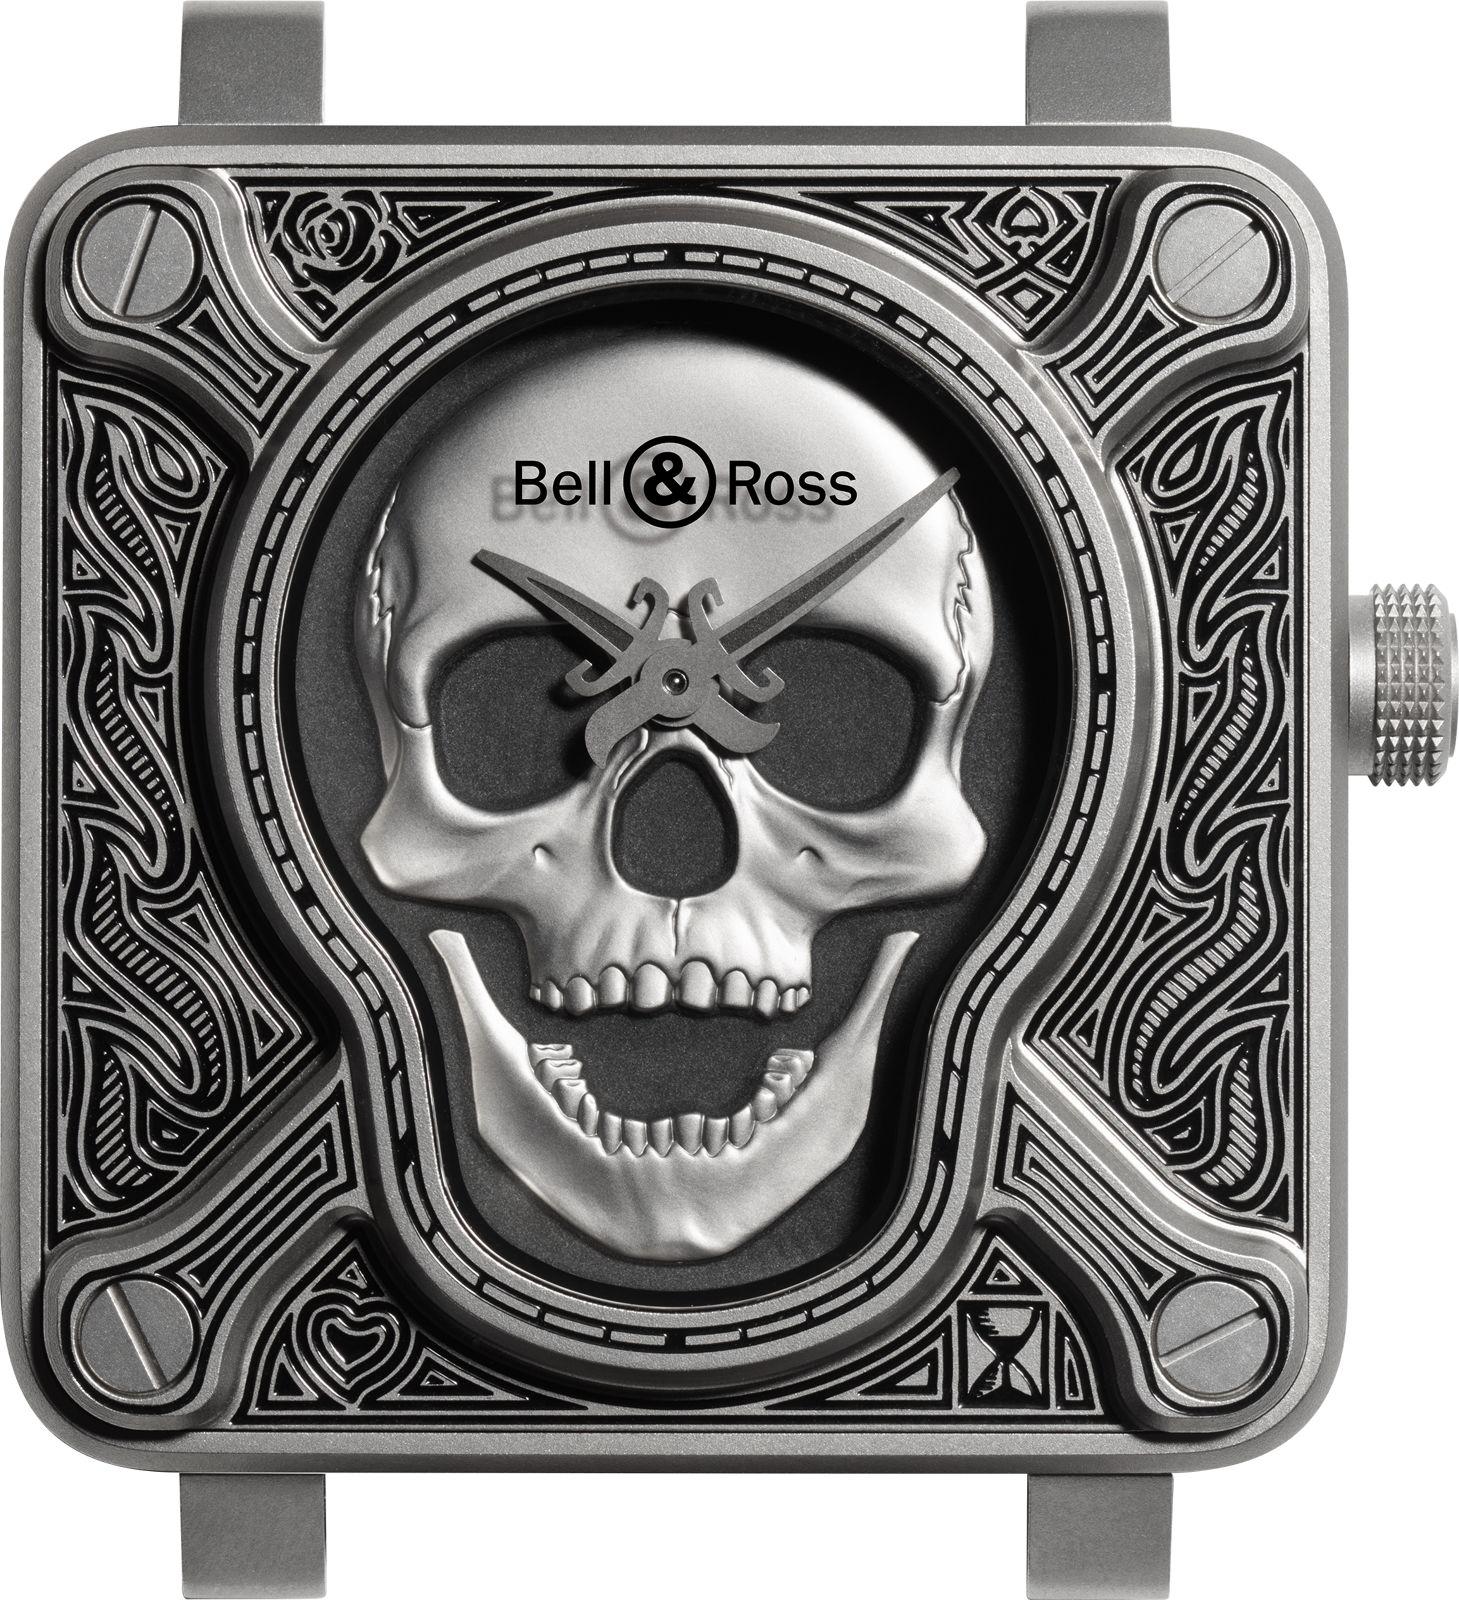 De BR 01 Burning Skull uit 2016